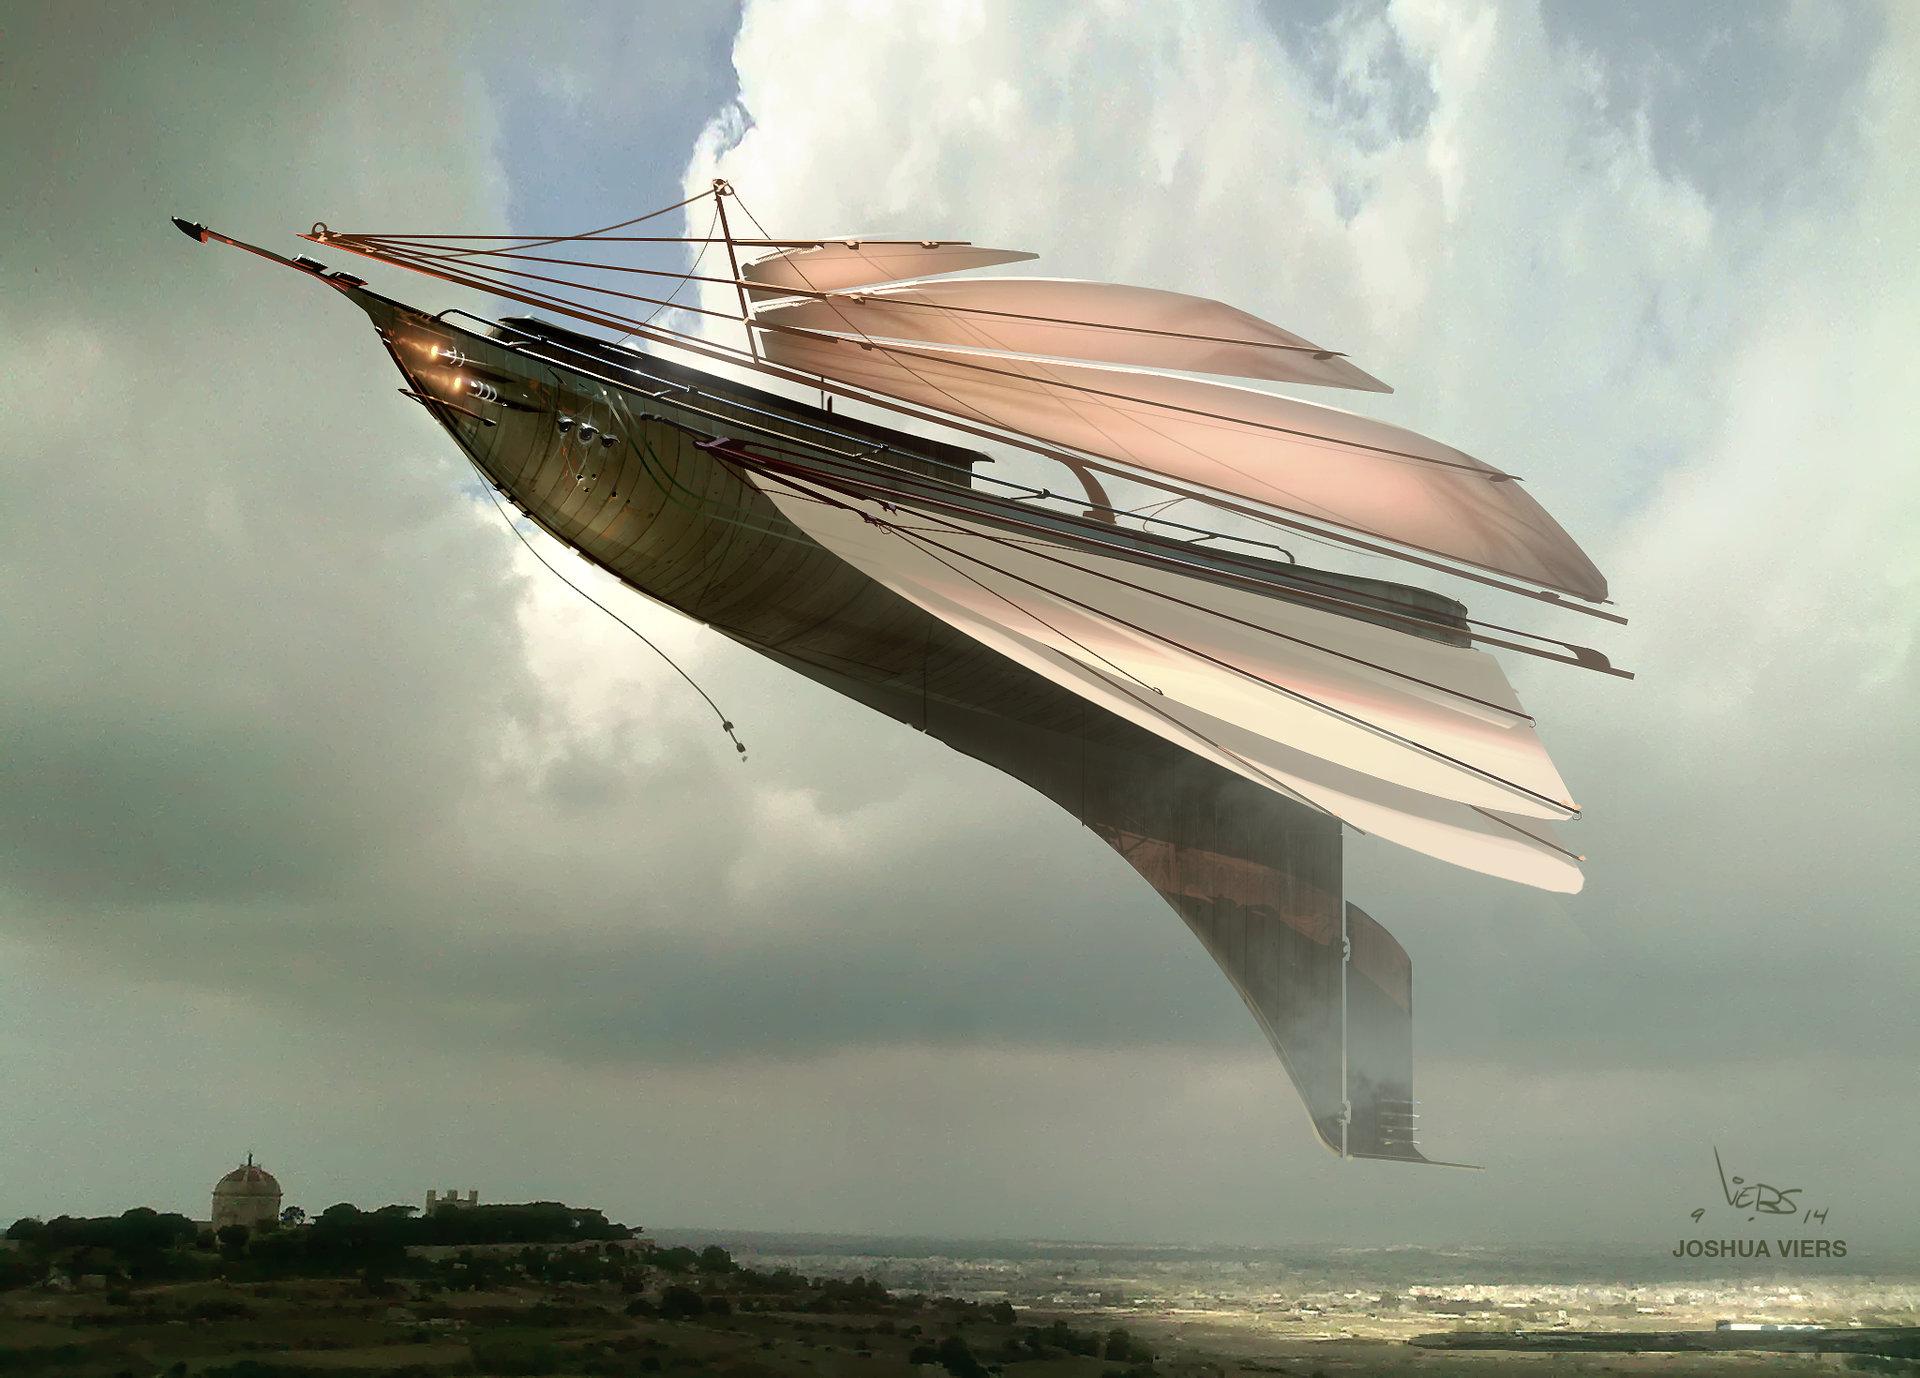 Joshua viers airshipsketch3c